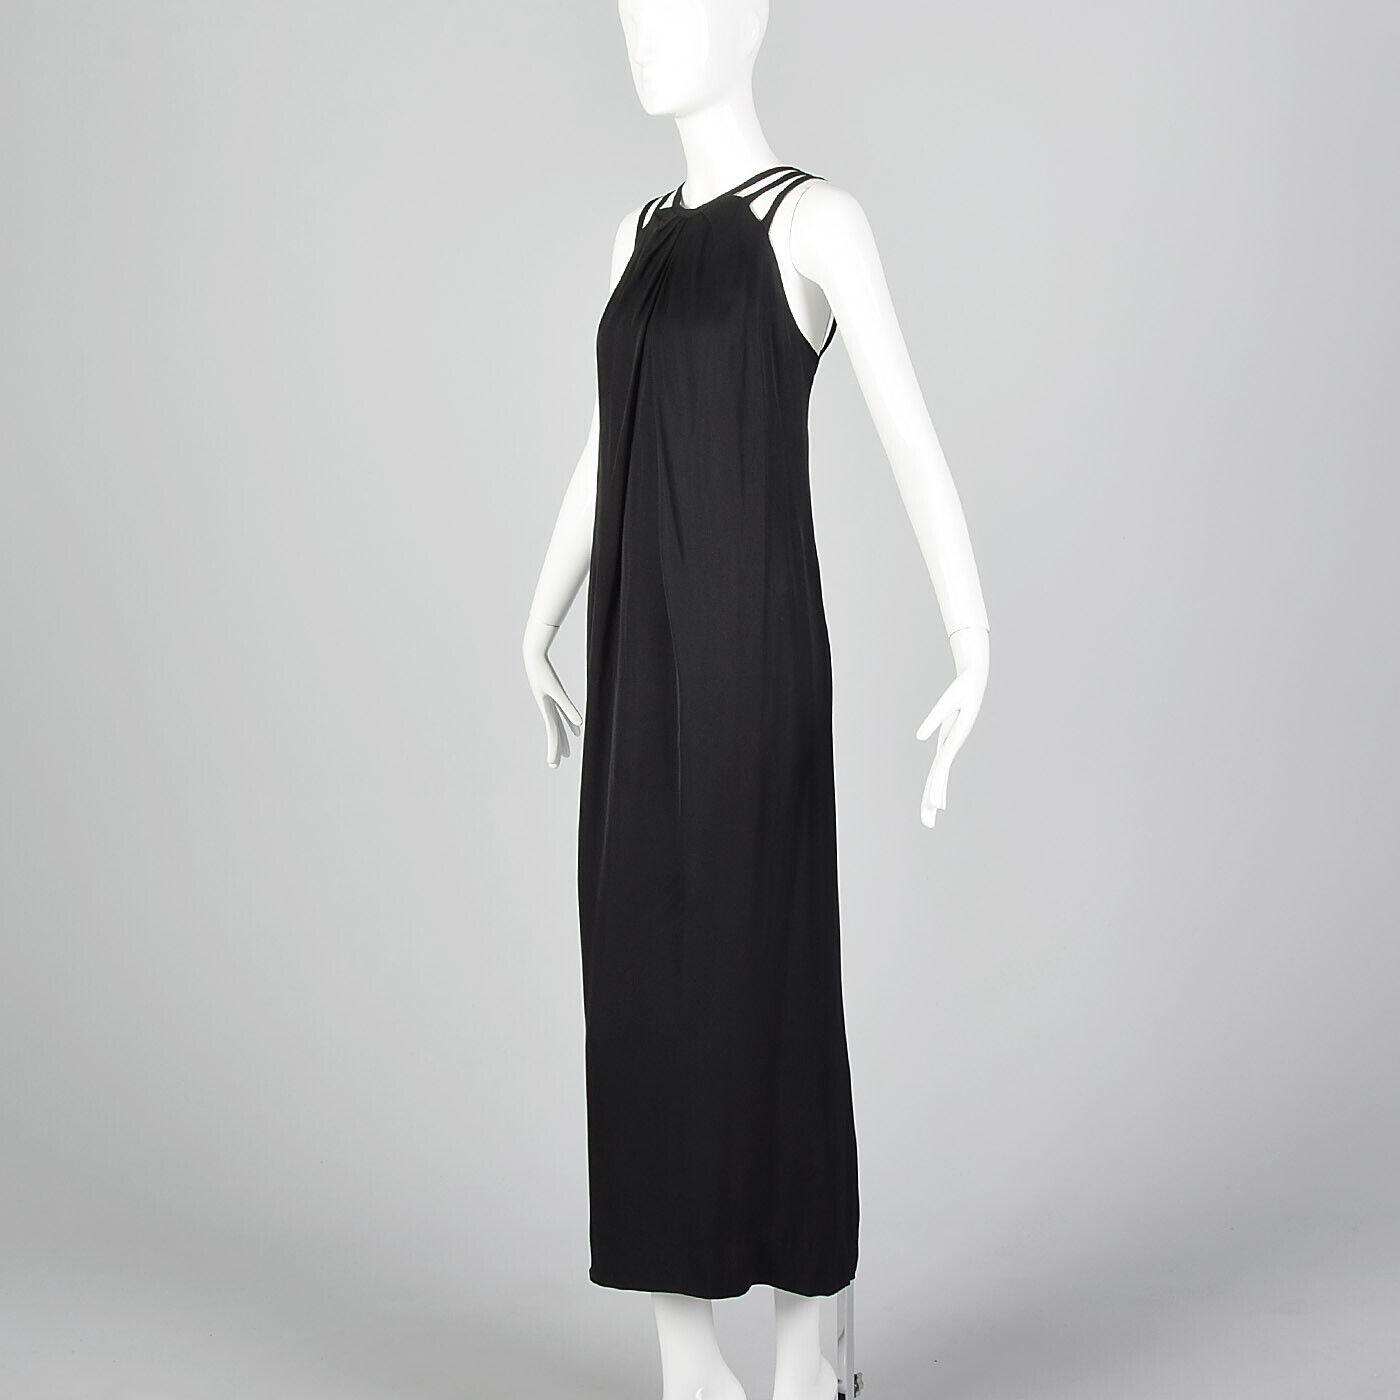 XXS 1960s Ceil Chapman Evening Dress Designer Bla… - image 2